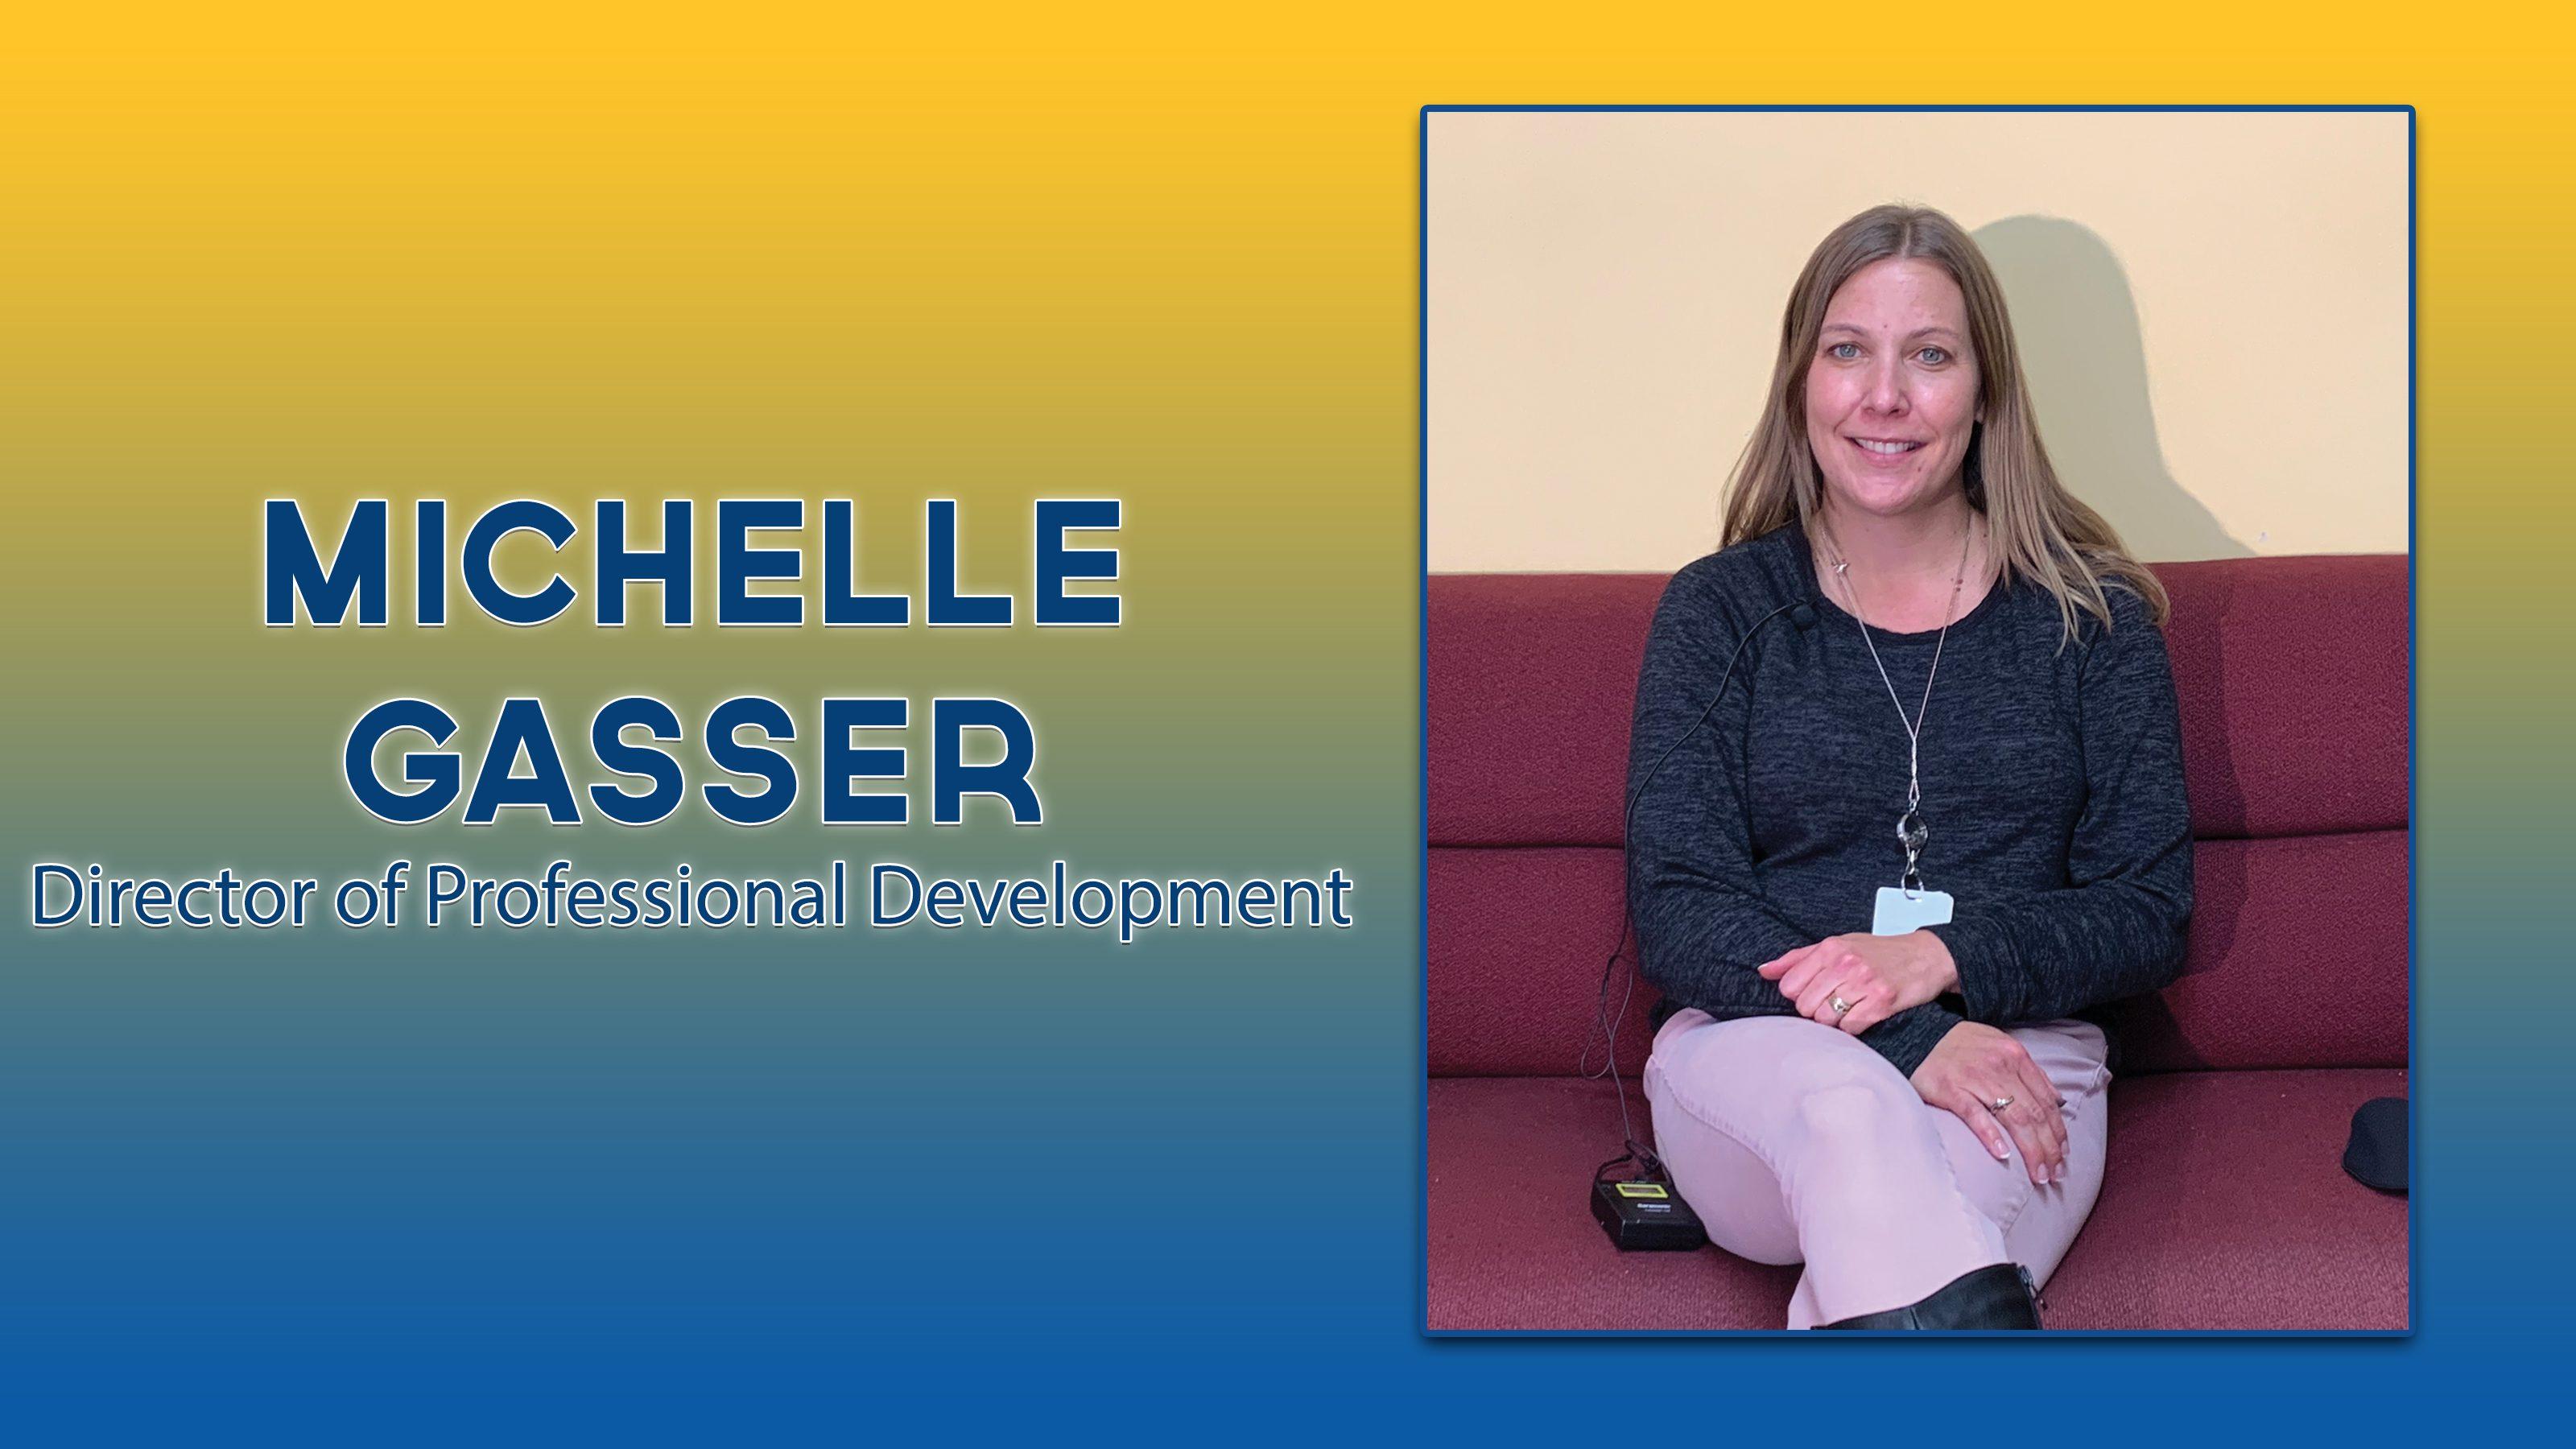 Michelle Gasser-Director of Professional Development